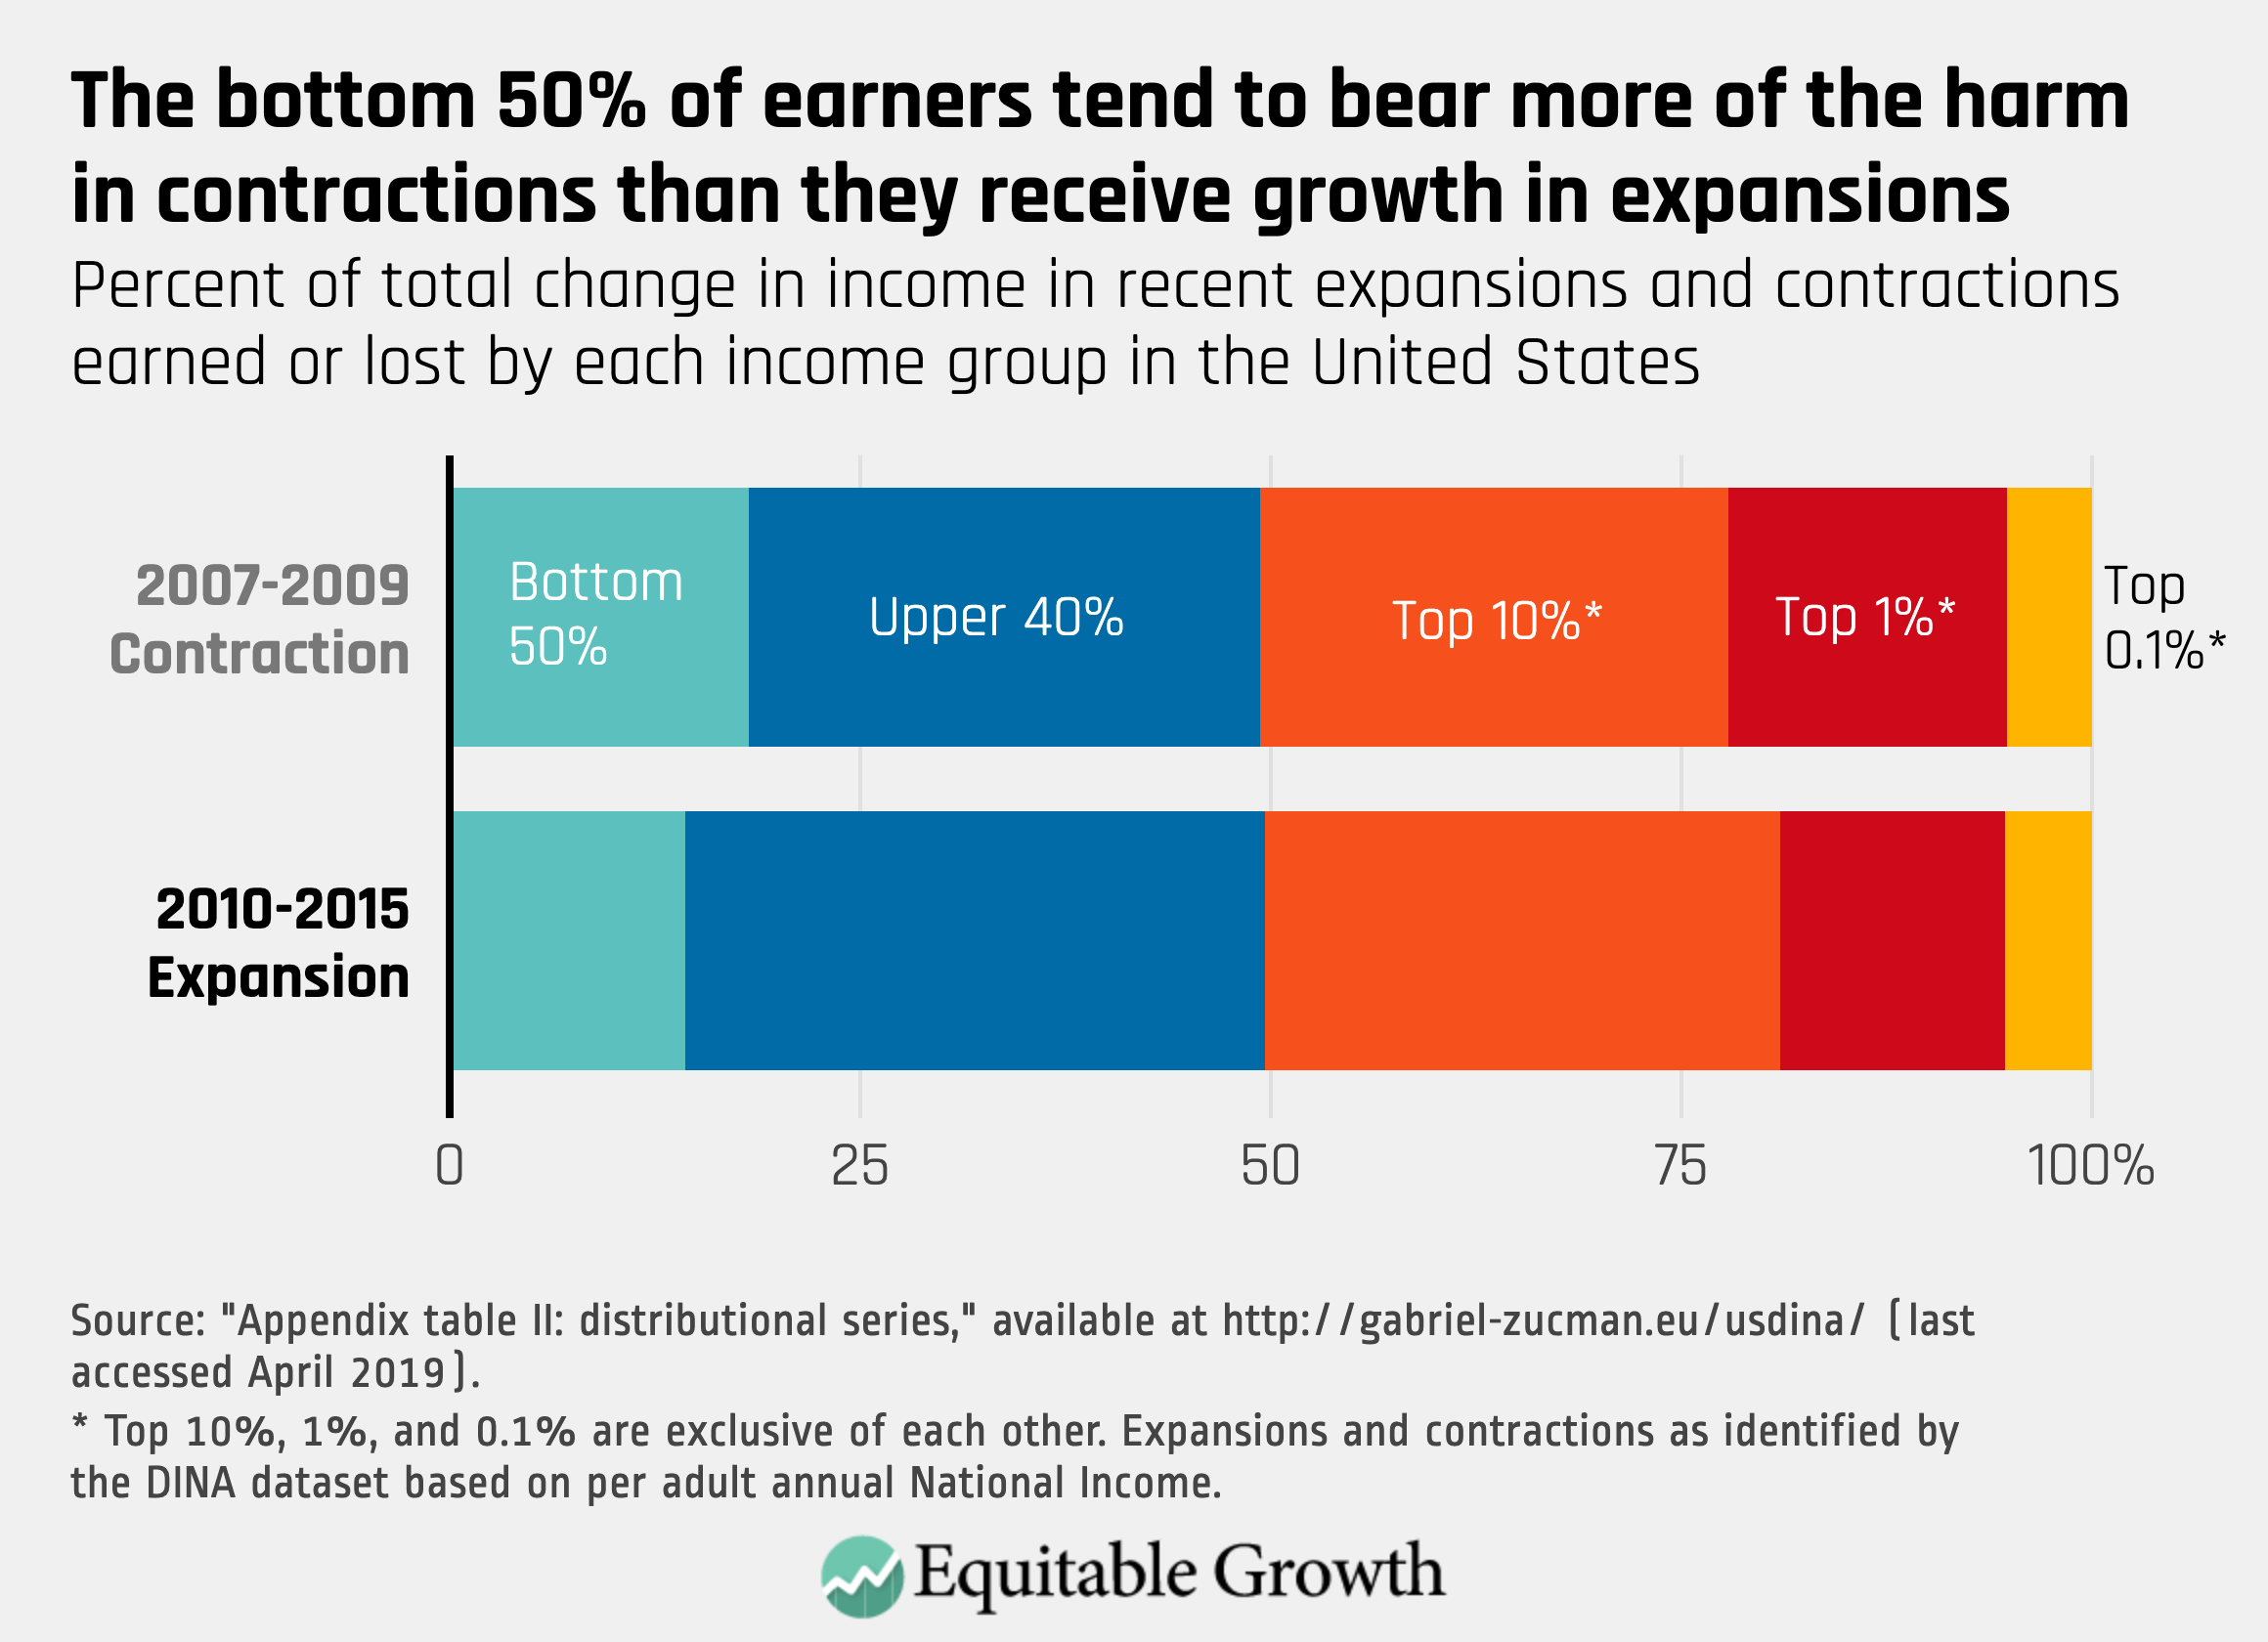 https://equitablegrowth.org/